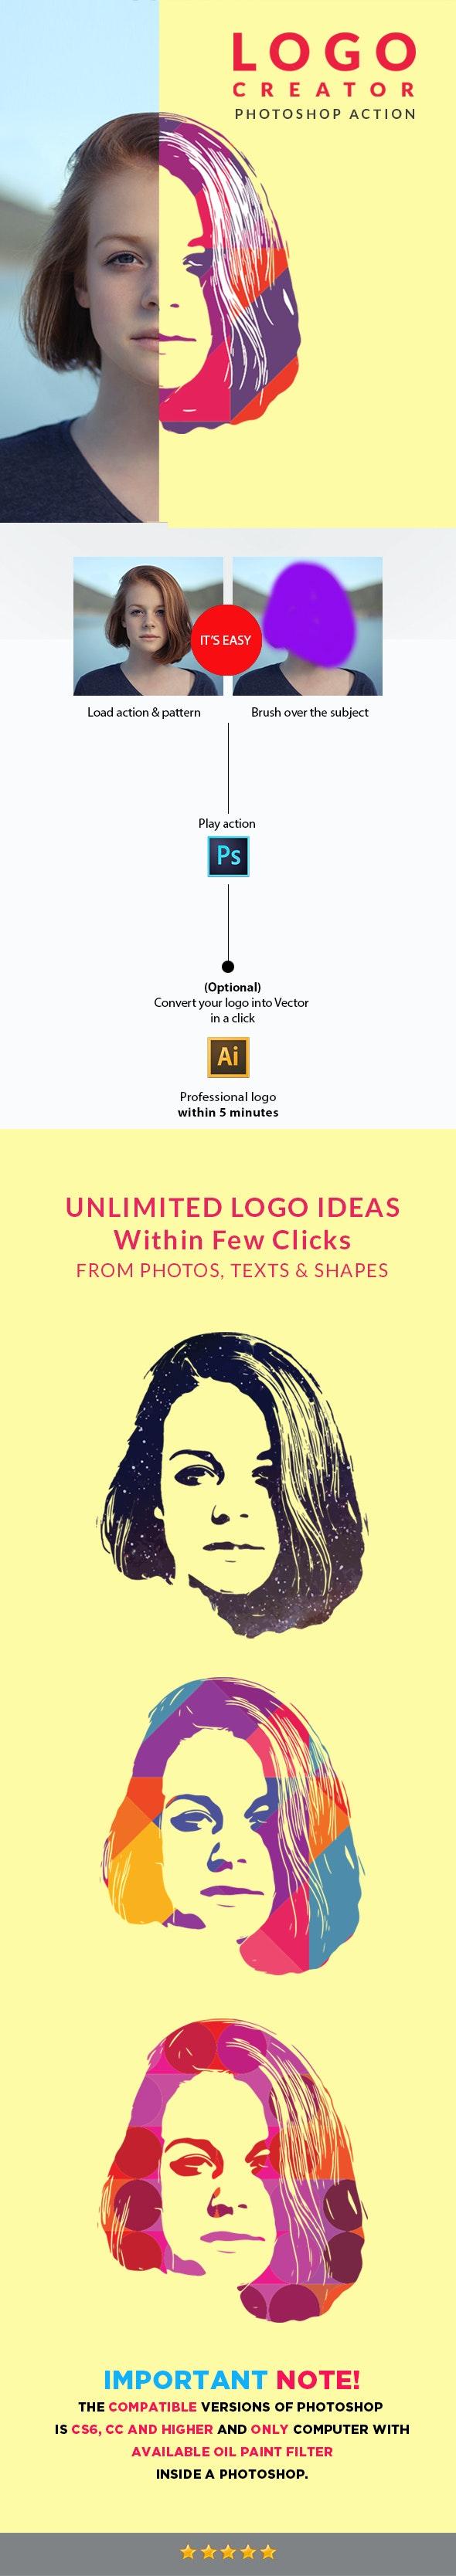 Professional Logo Creator - Actions Photoshop